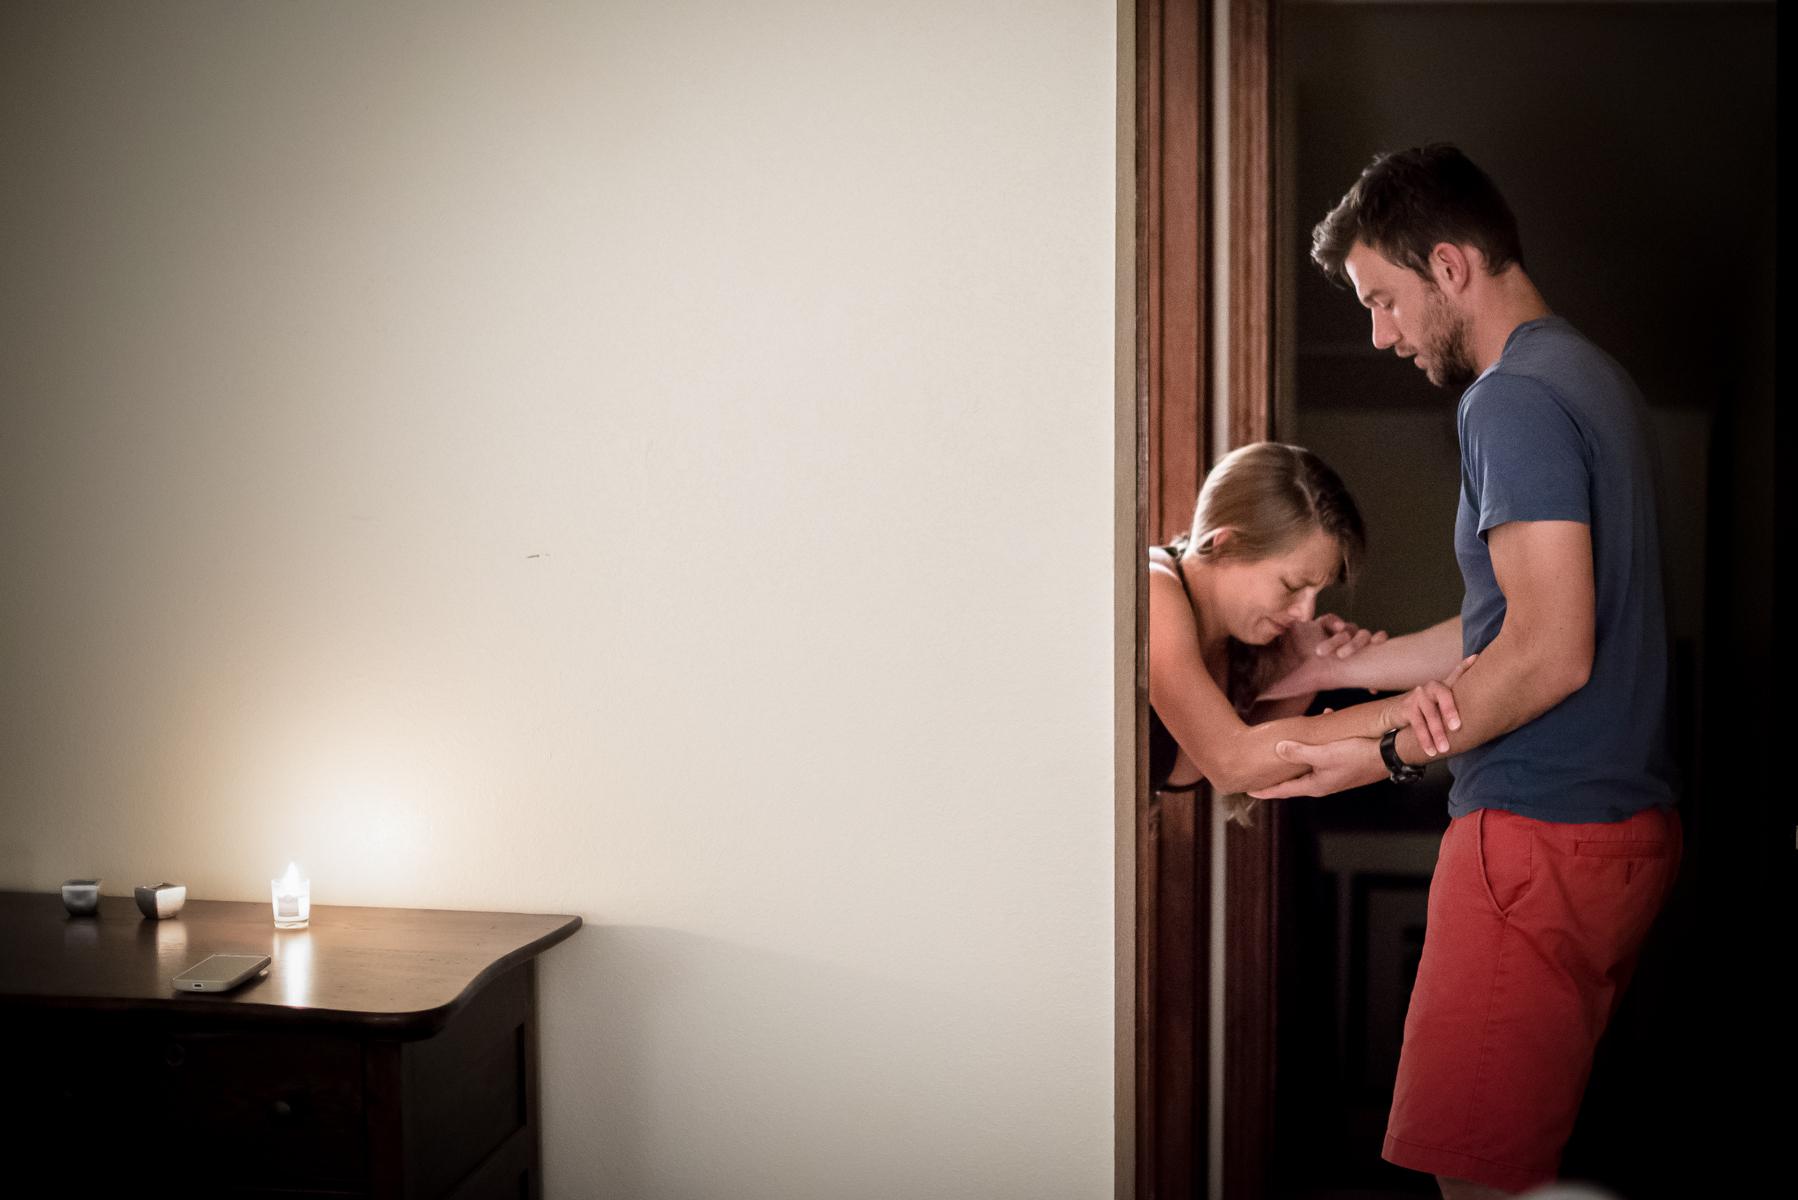 Colorado-springs-birth-photographer-home-birth-labor-support